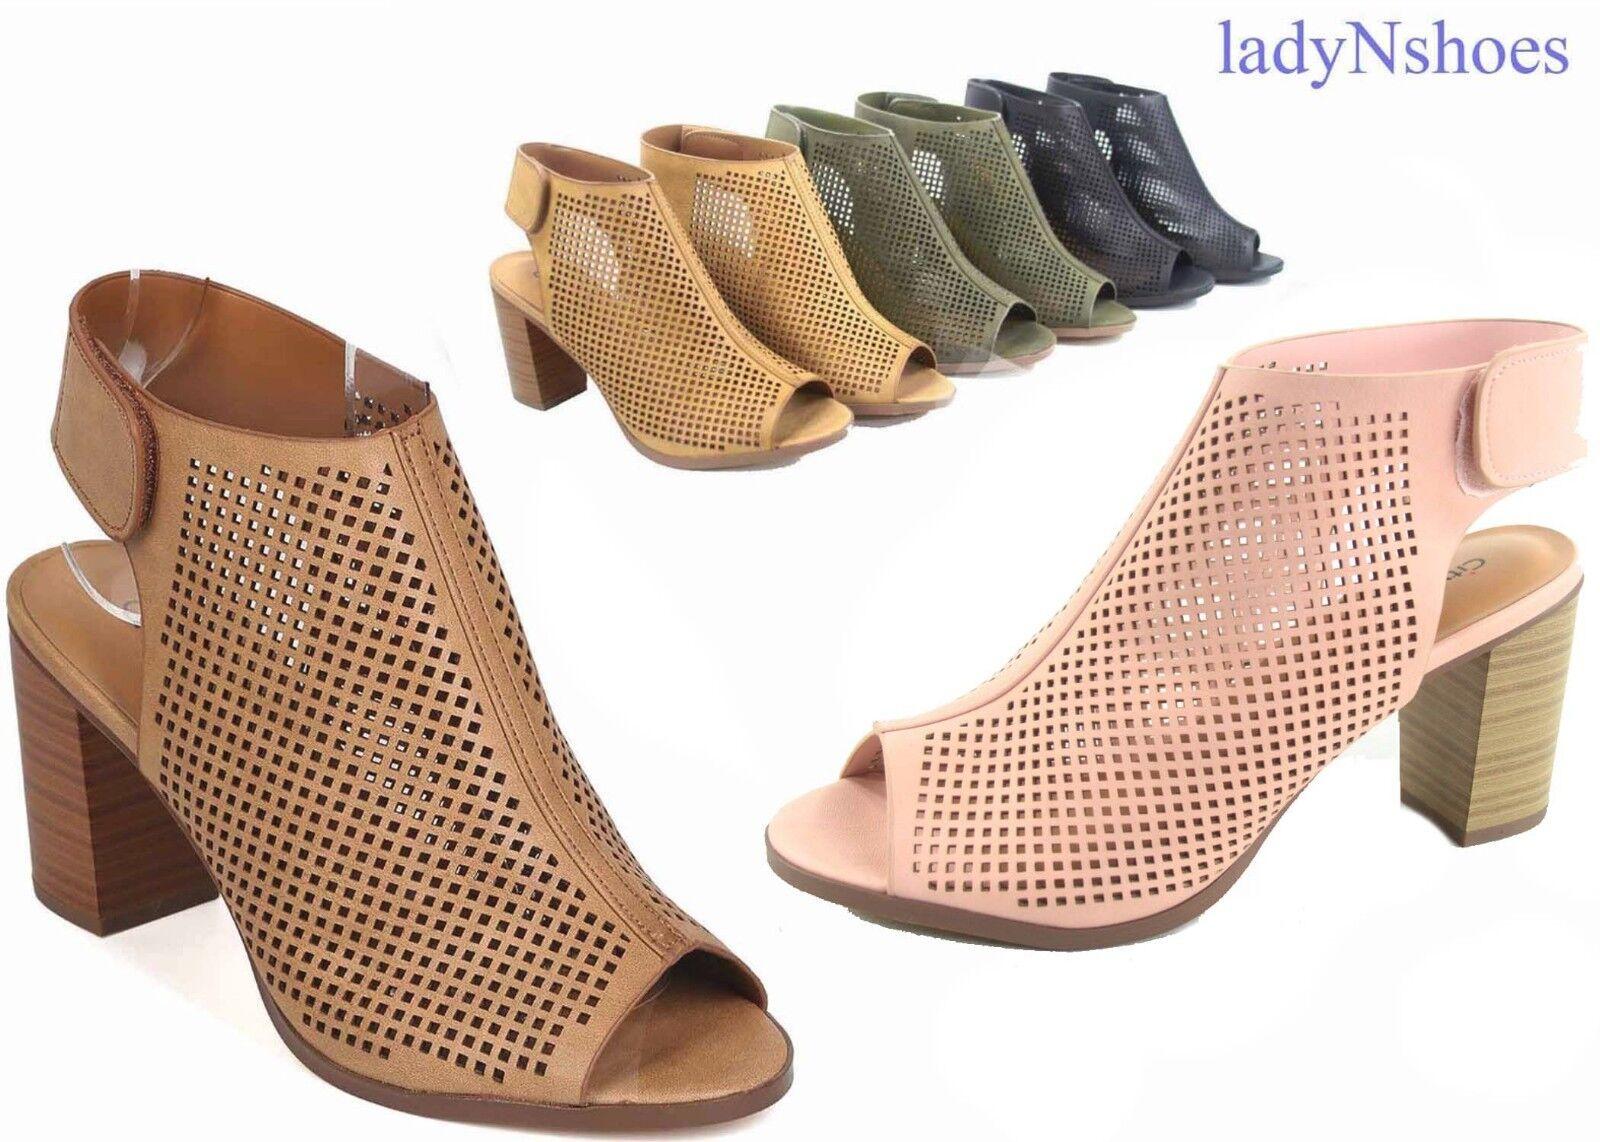 NEW Women's Sling back Peep Toe Chunky Heels Heels Chunky Sandal Booties Shoes Size 5.5 - 11 0e061b